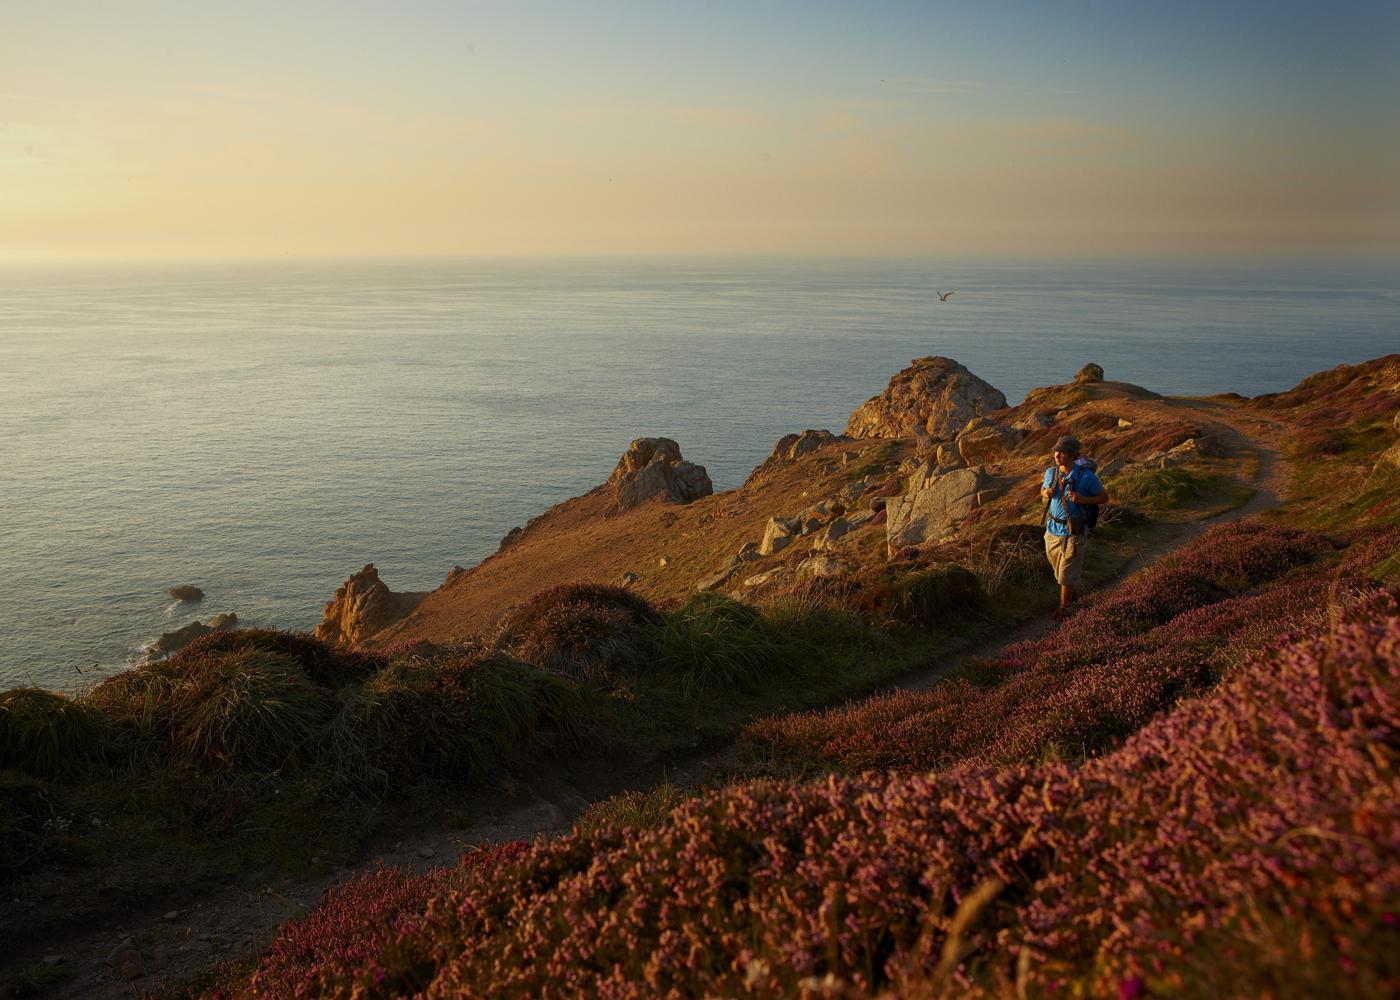 Sierra Club Channel Islands